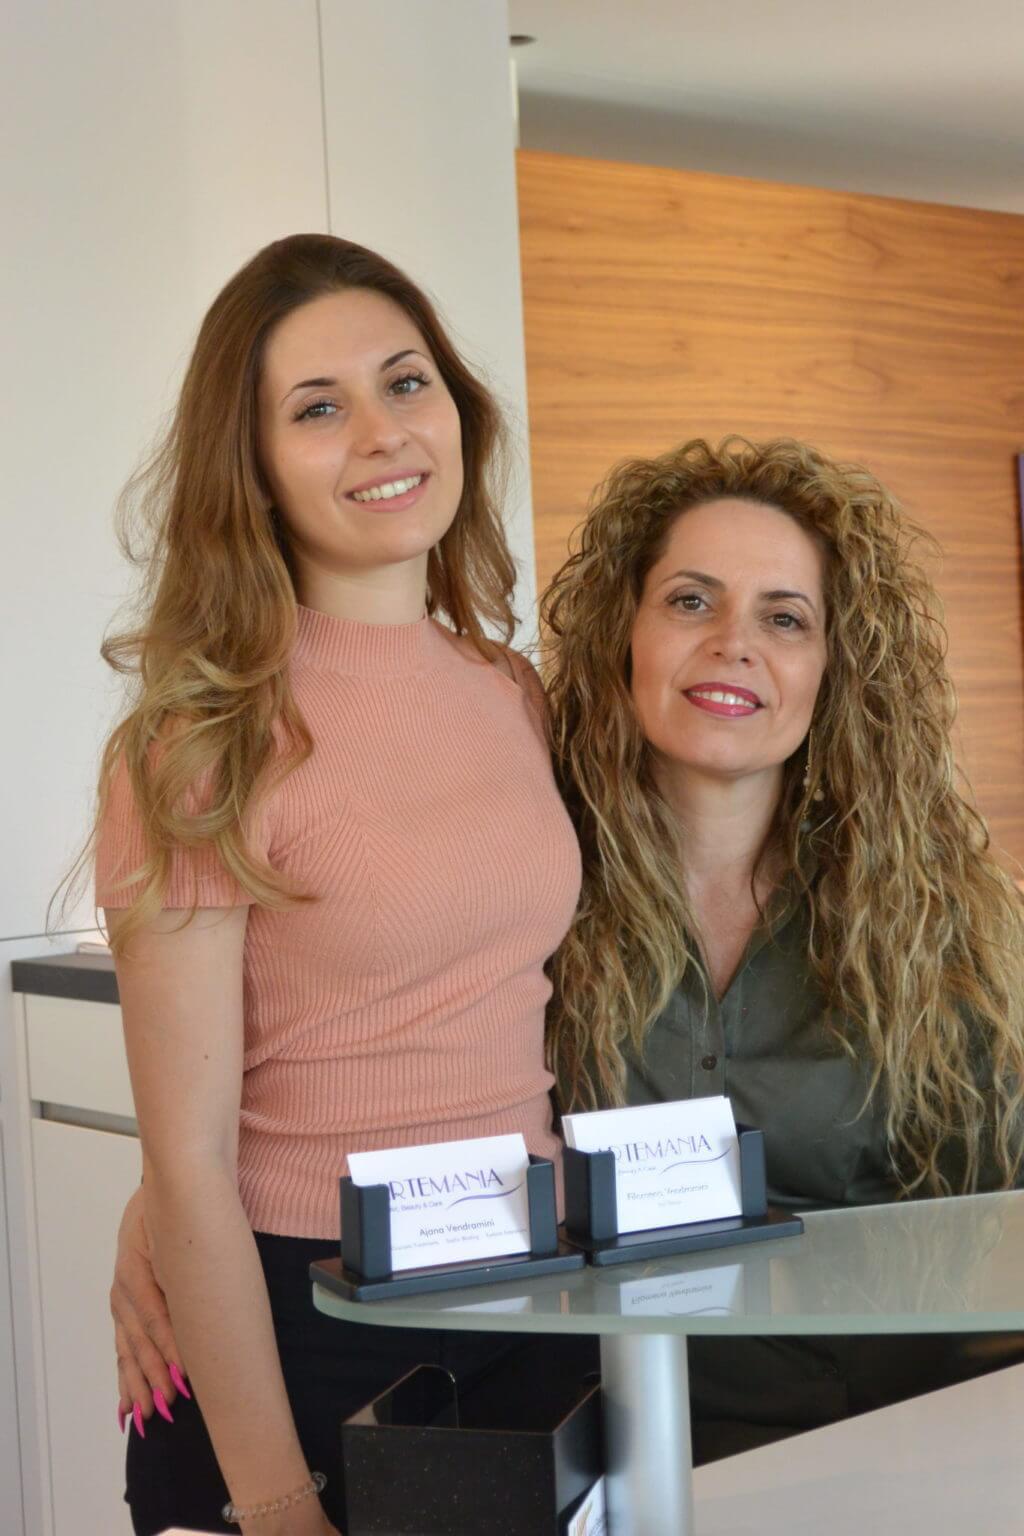 Ajana und Filomena Vendramini - Kosmetik Artemania Fehraltorf - Nail Art - Beauty und Care